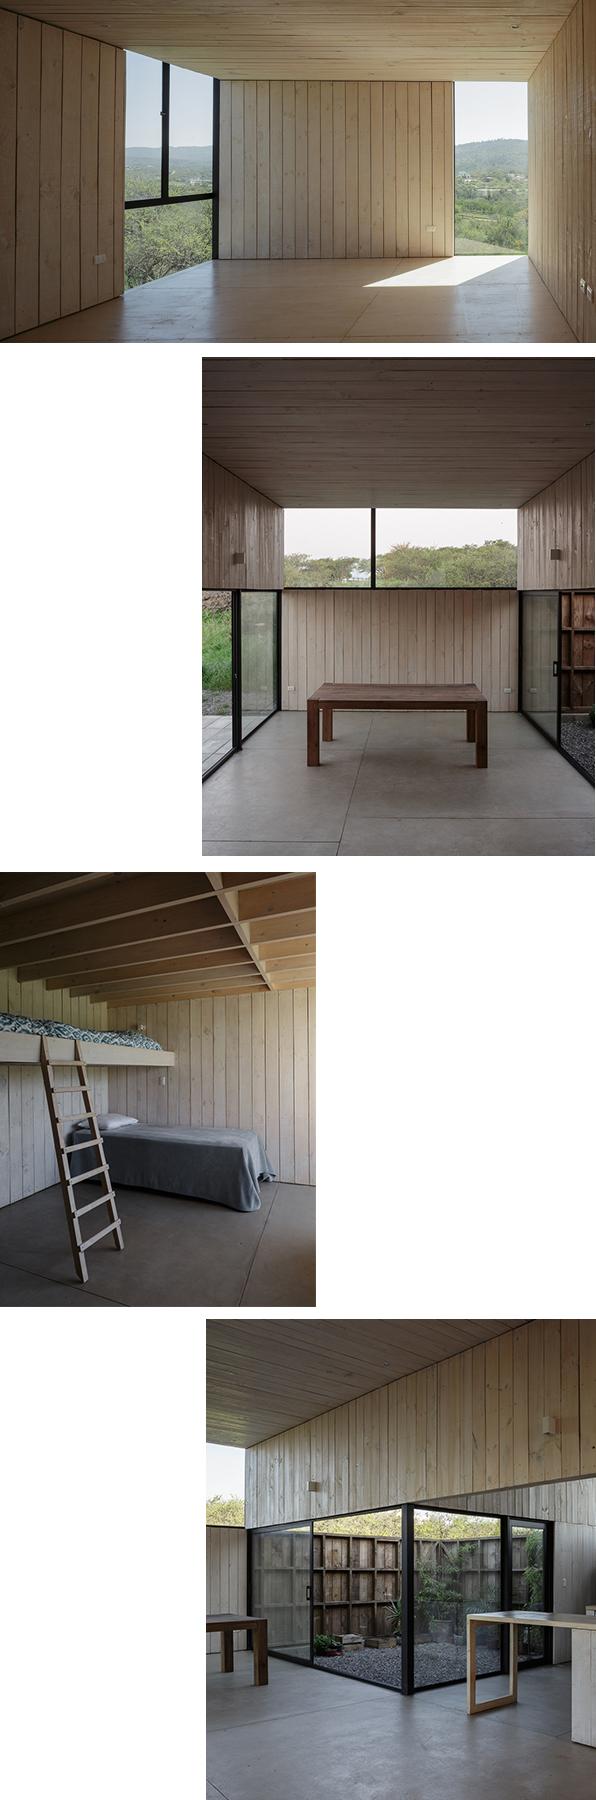 cml torrejon chadwick en modusvivendi arquitectura architecture prefab modular wood madera vivienda de 4 alas